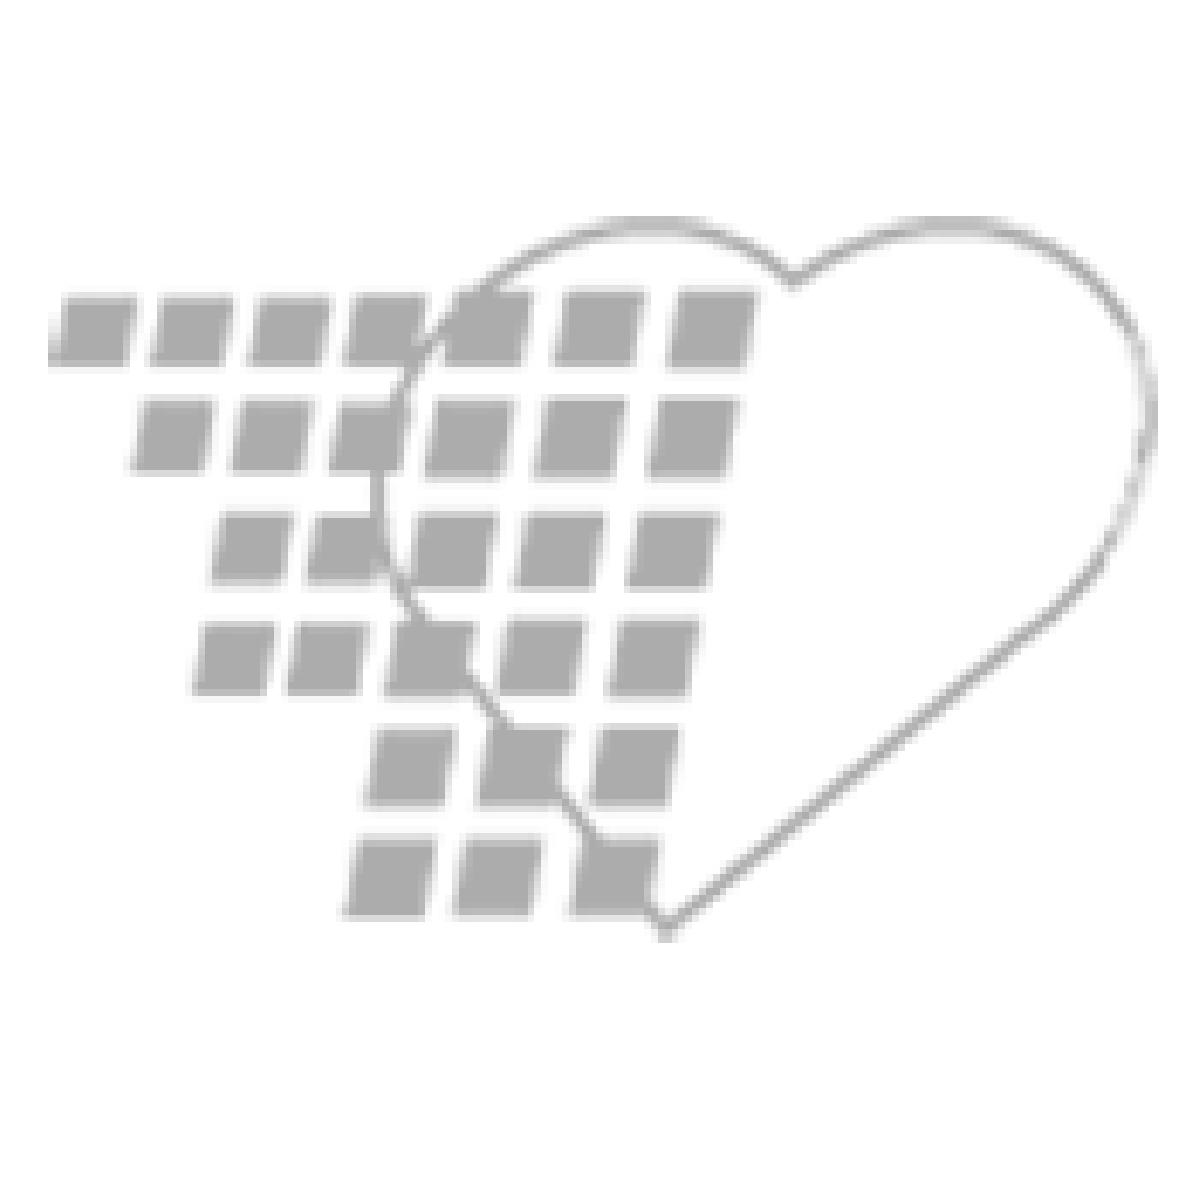 06-93-2025 Demo Dose® Lispr Insuln 100 units mL 10 mL